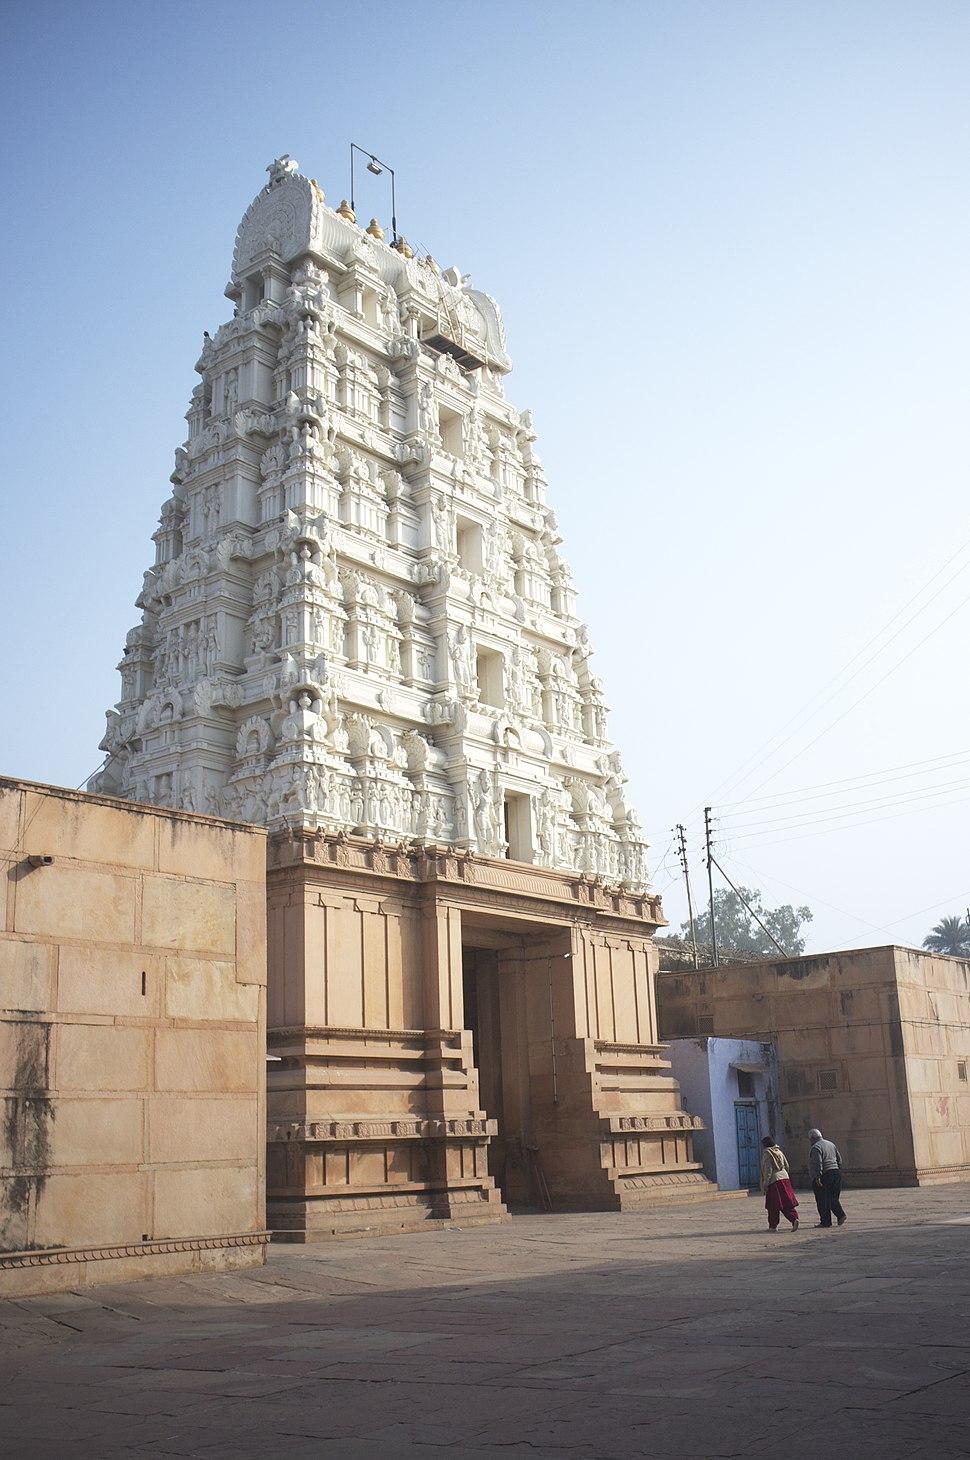 Vrindavan, India (20566547434)